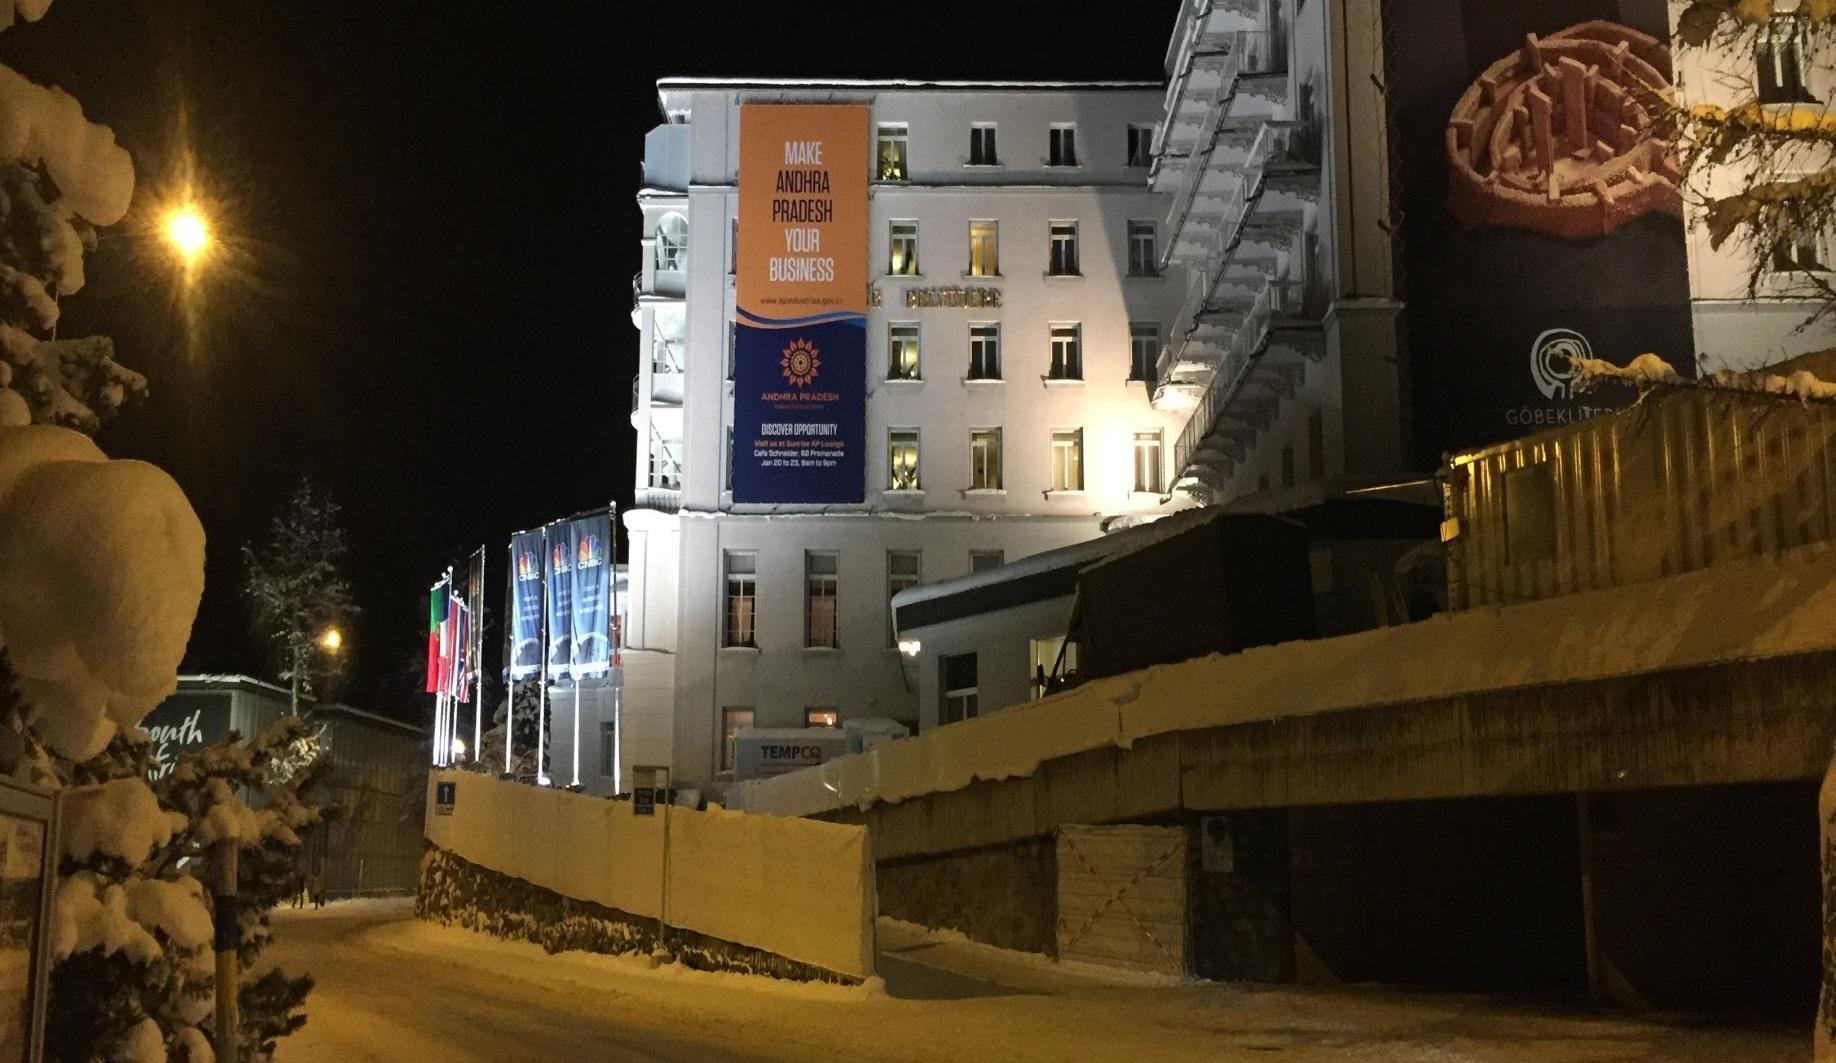 Andhra Pradesh brand positioning Davos 2016